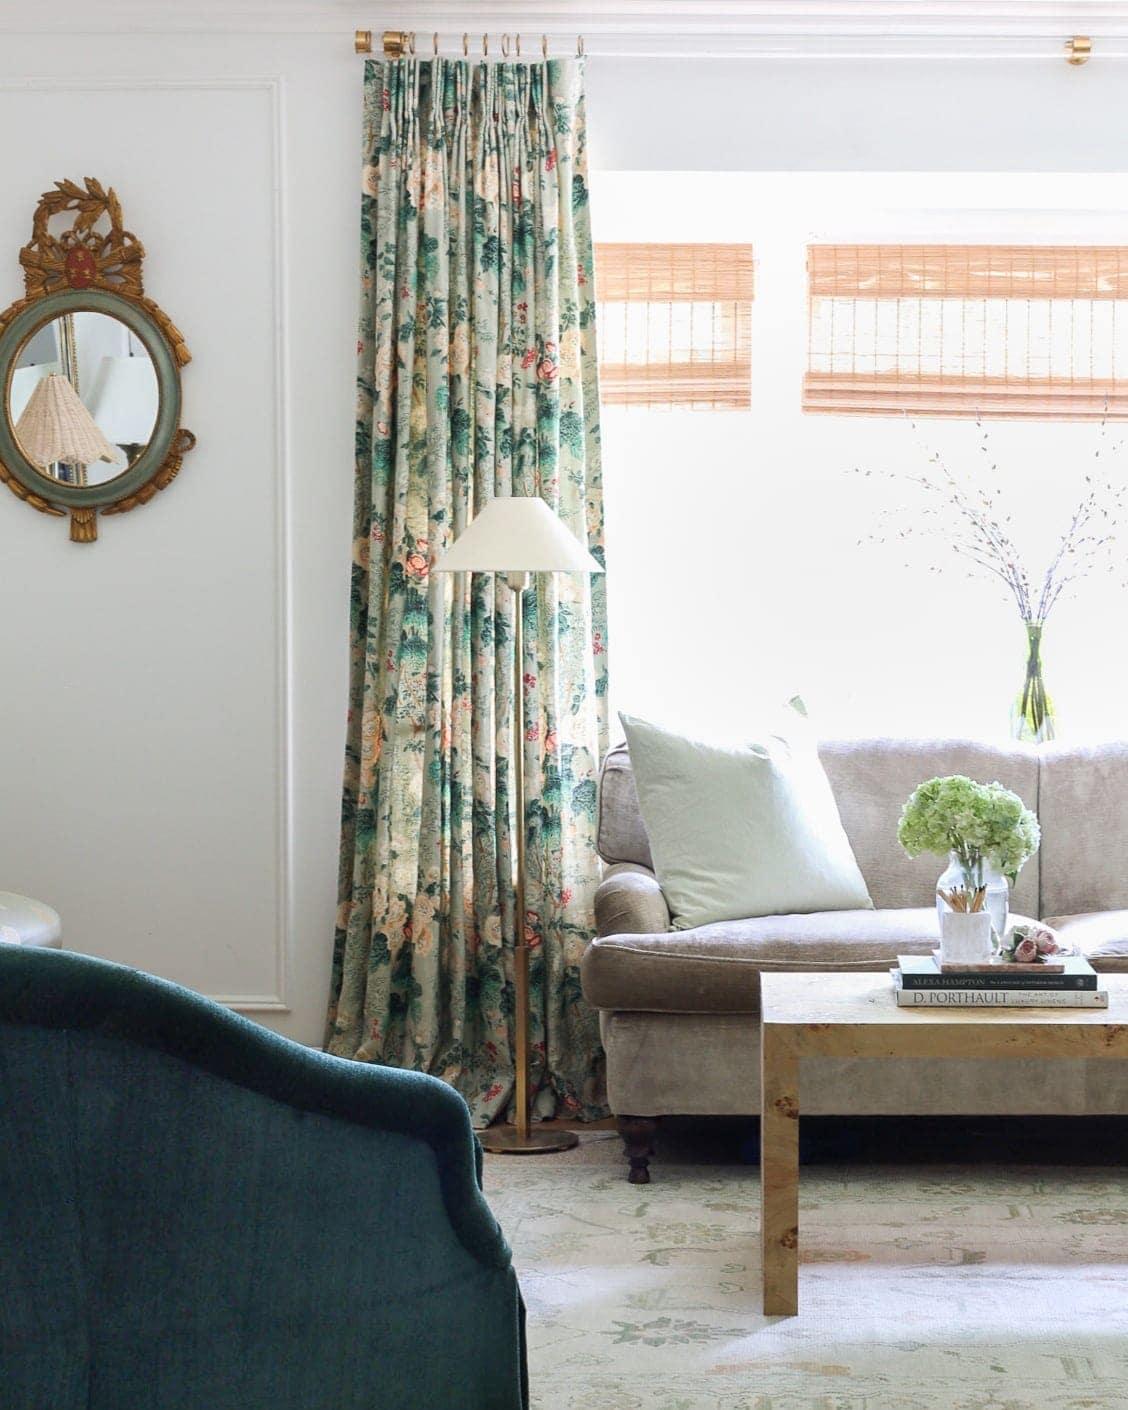 custom-drapes-living-room-design